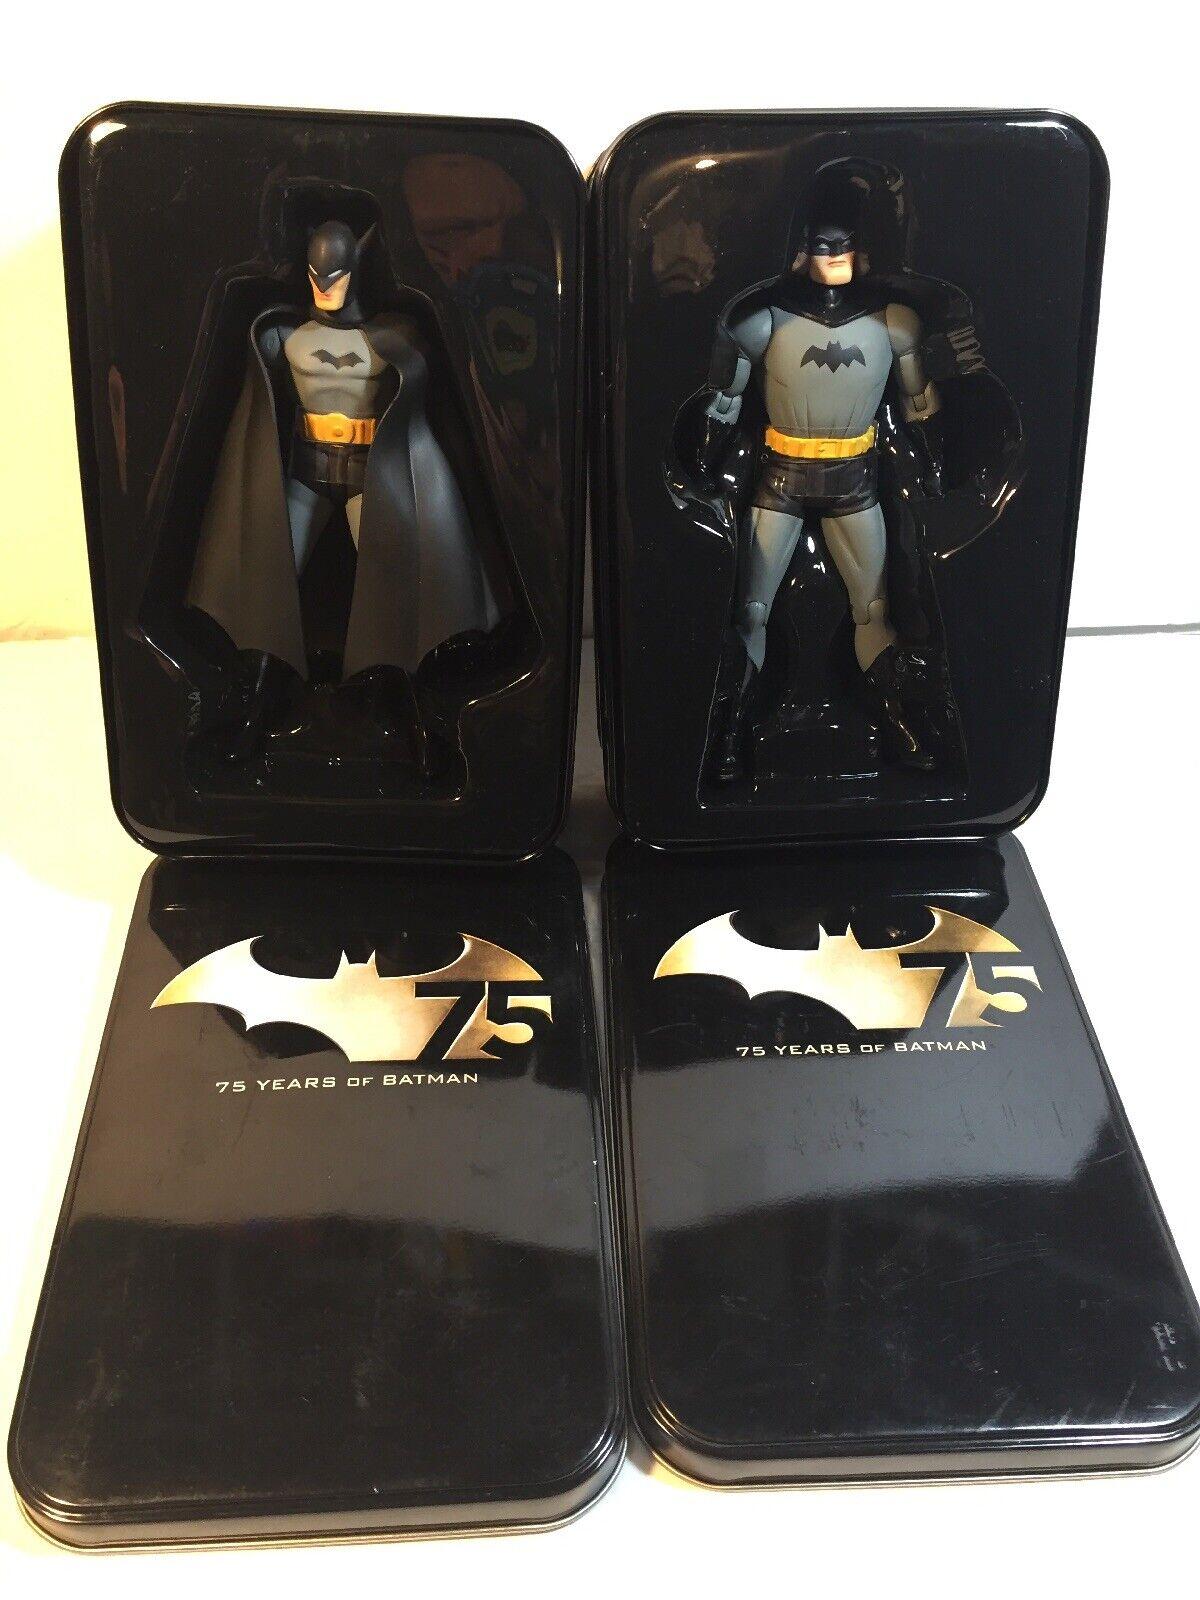 2-Batman 75th Anniversary Figures In Tin